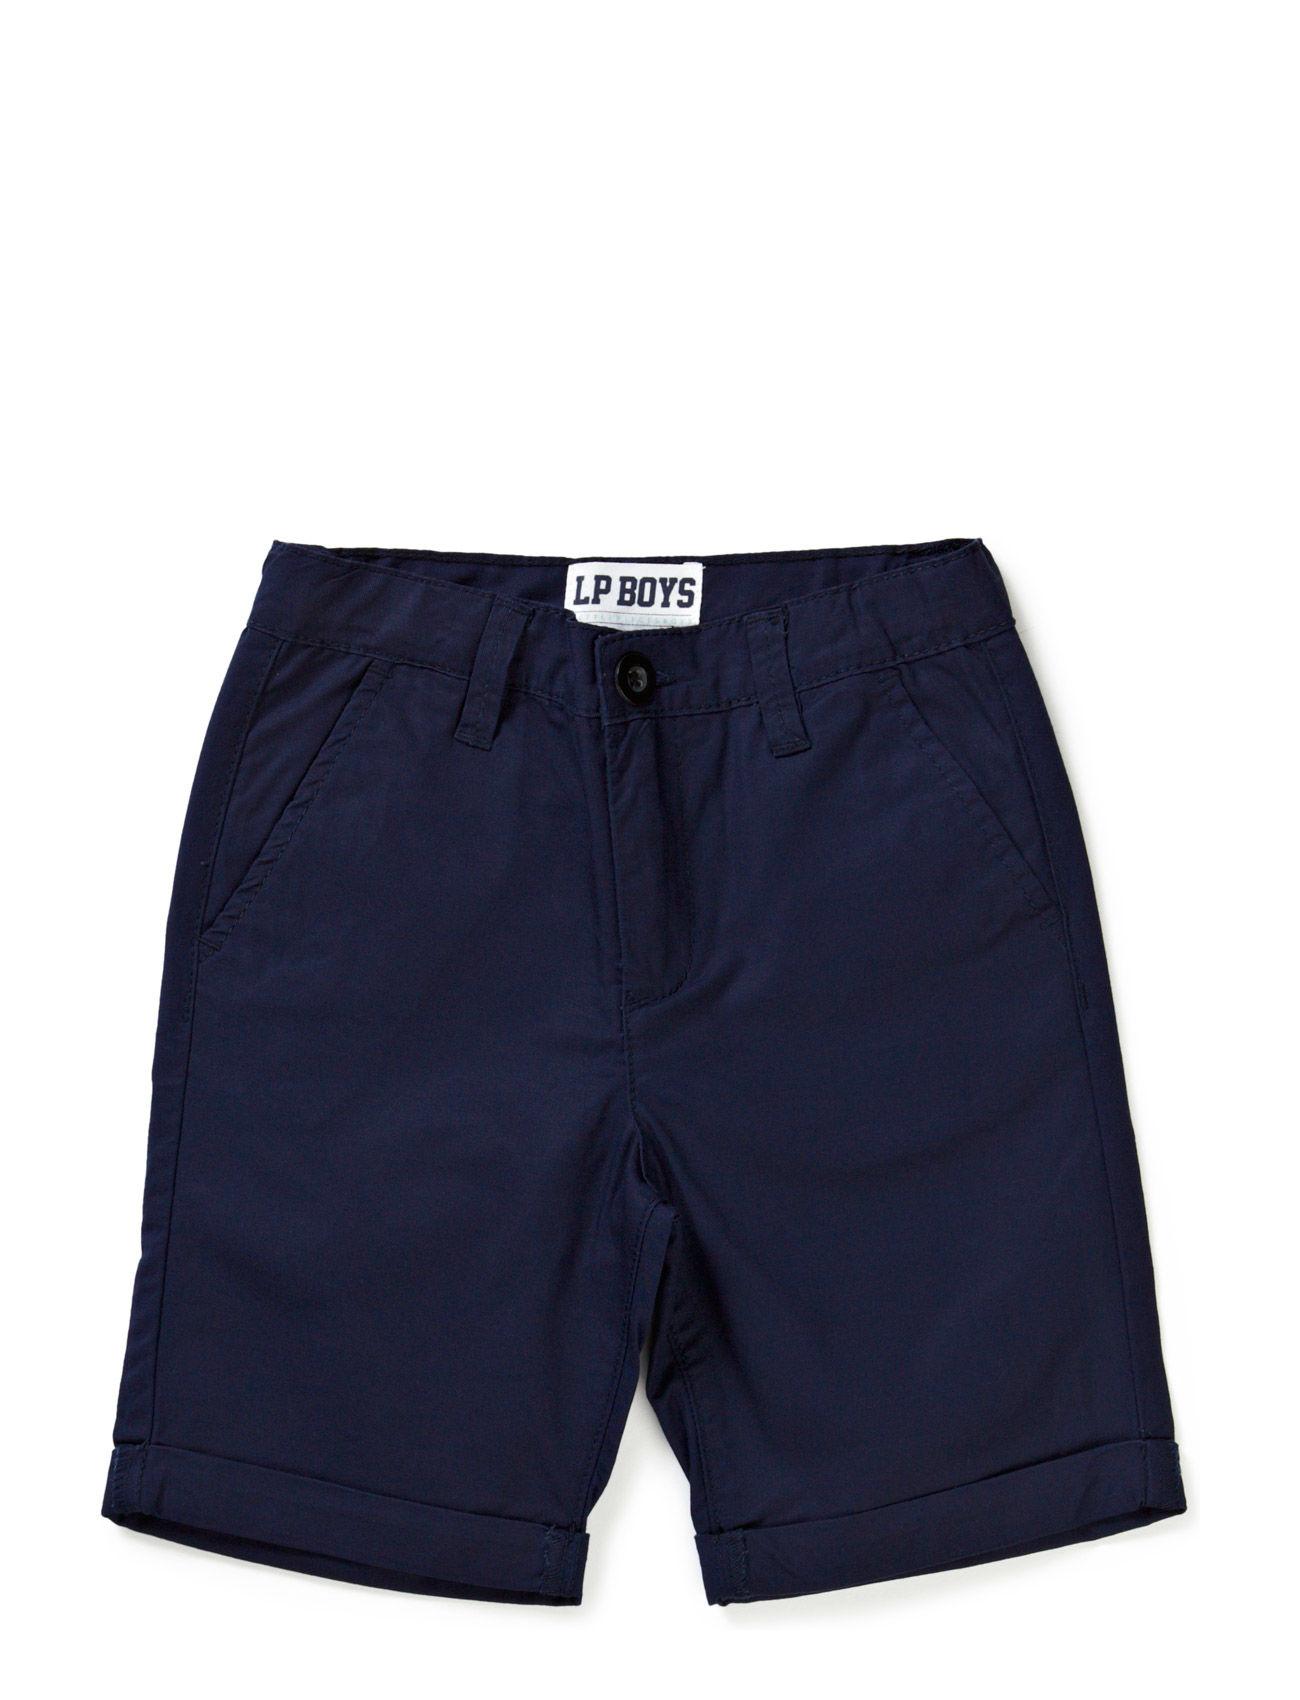 Lpb Chino Shorts